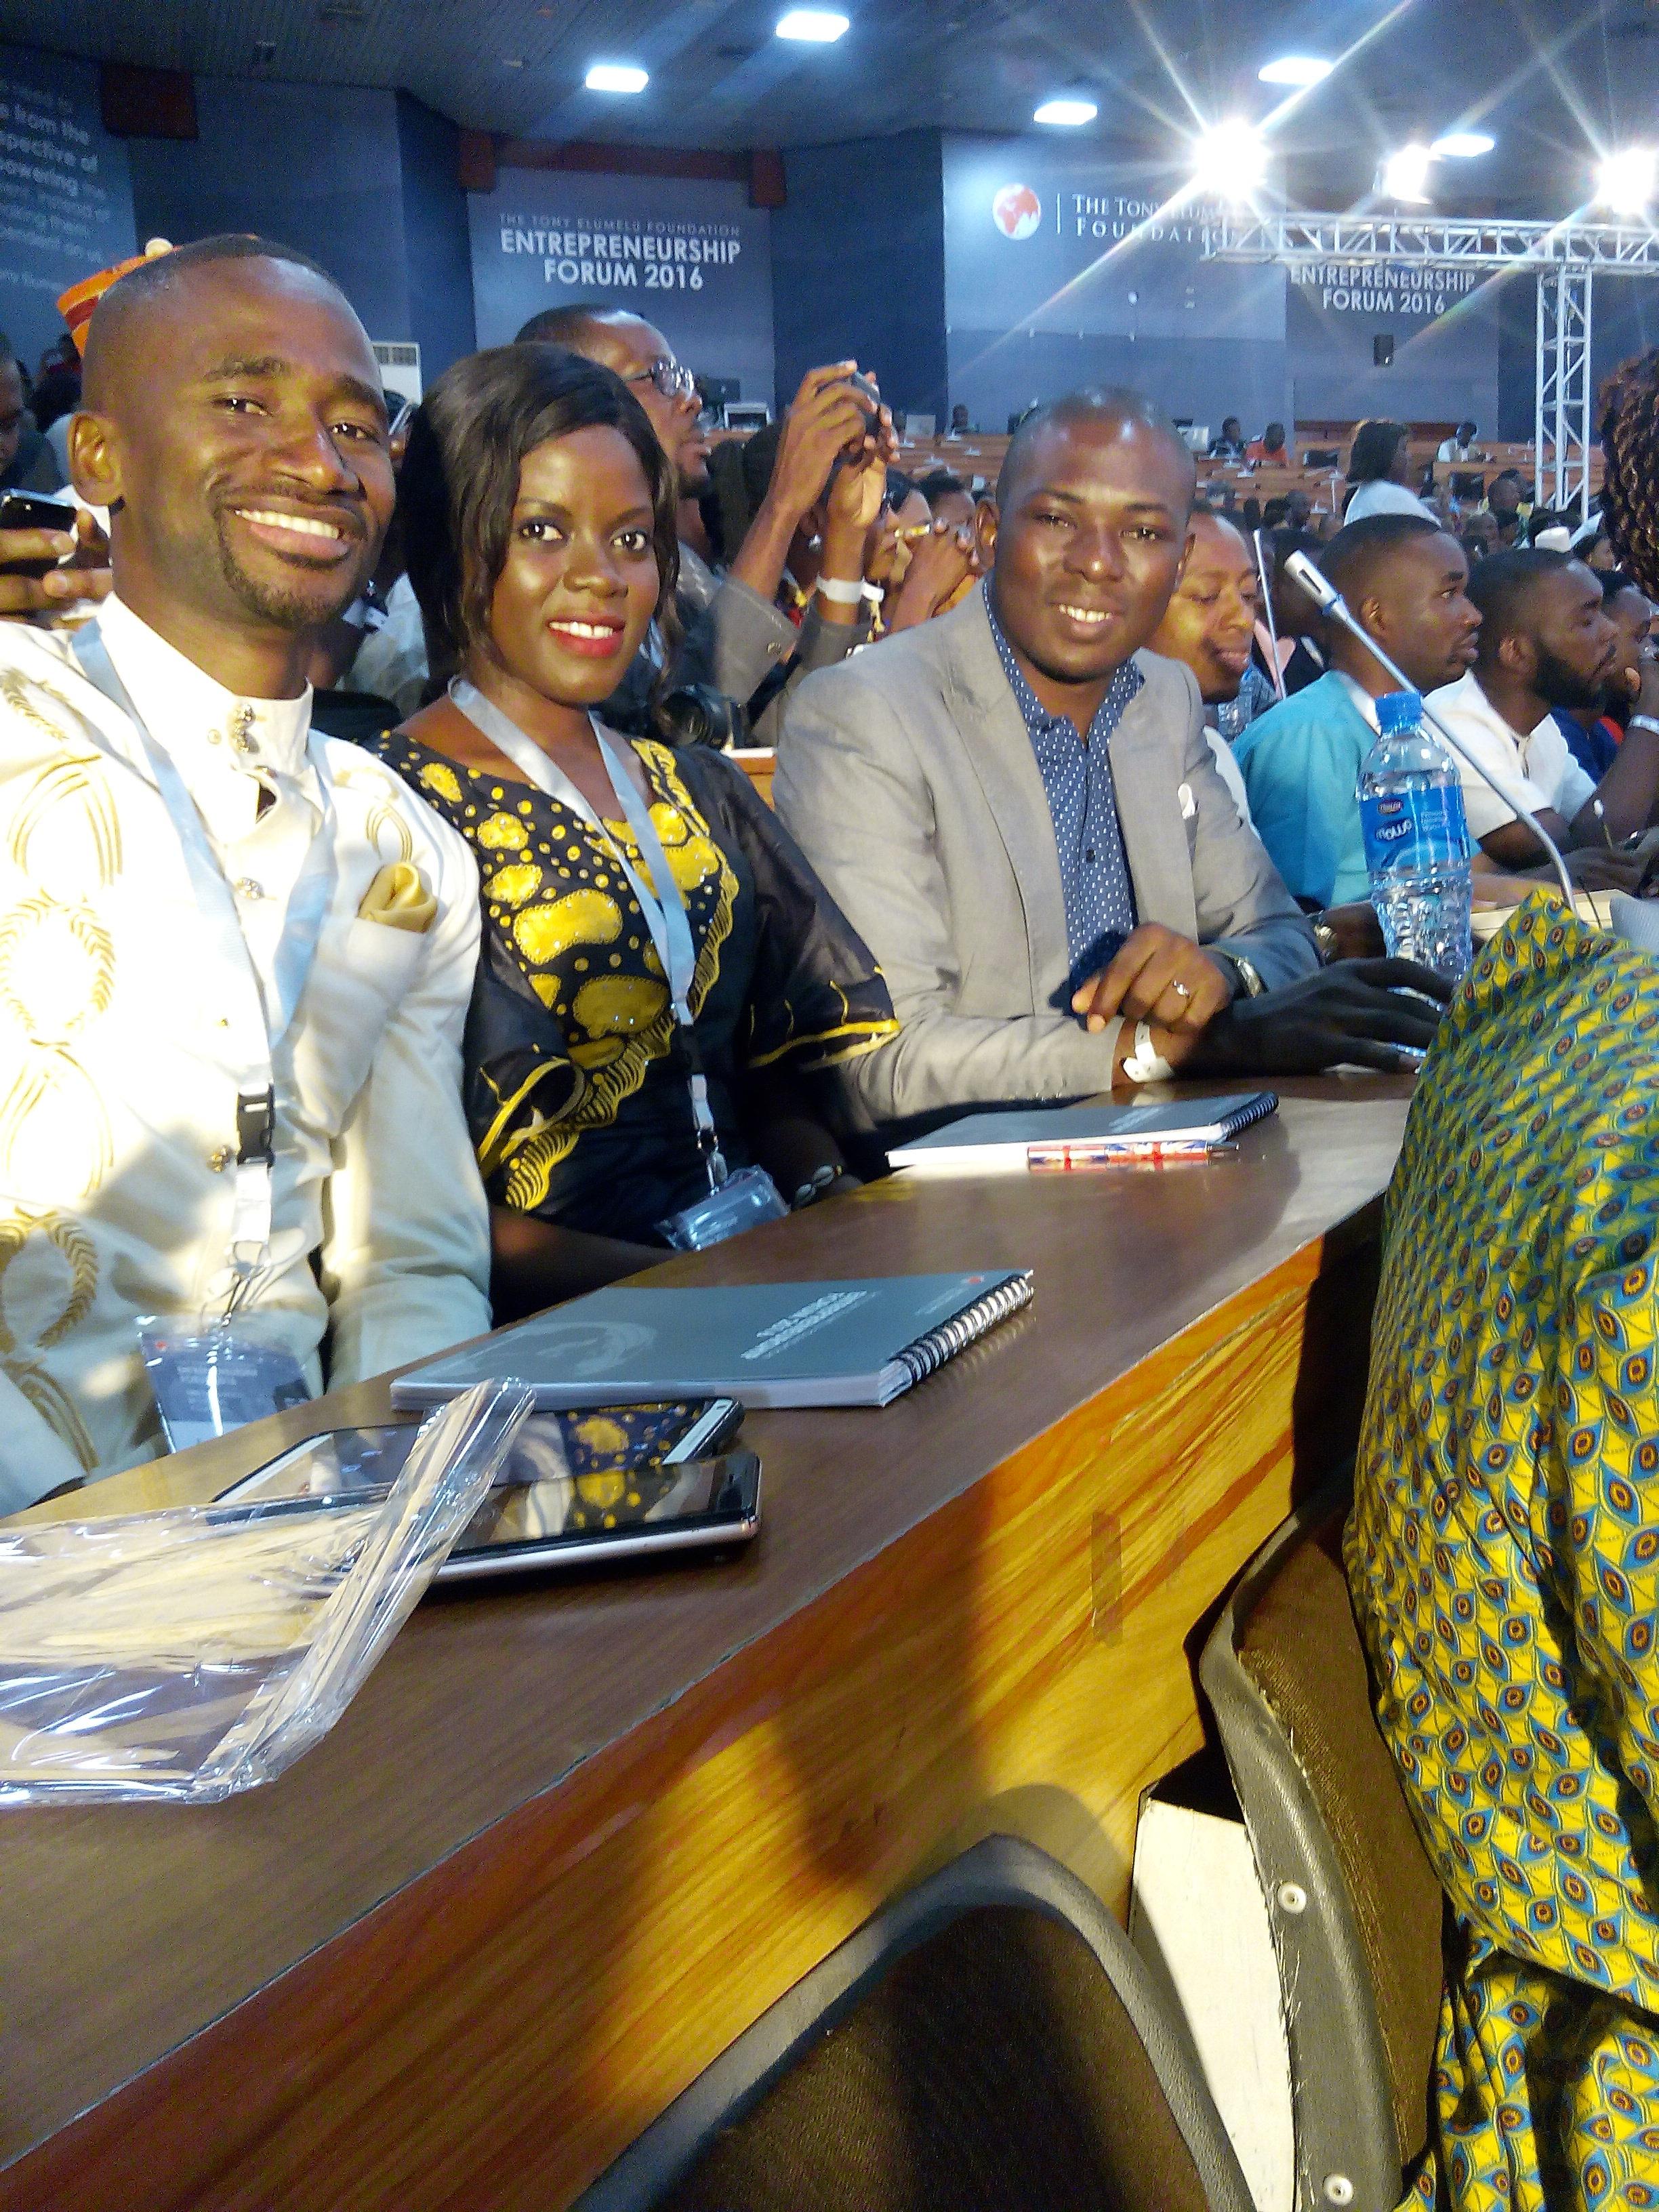 4-tony-elumelu-entrepreneurship-forum-2016